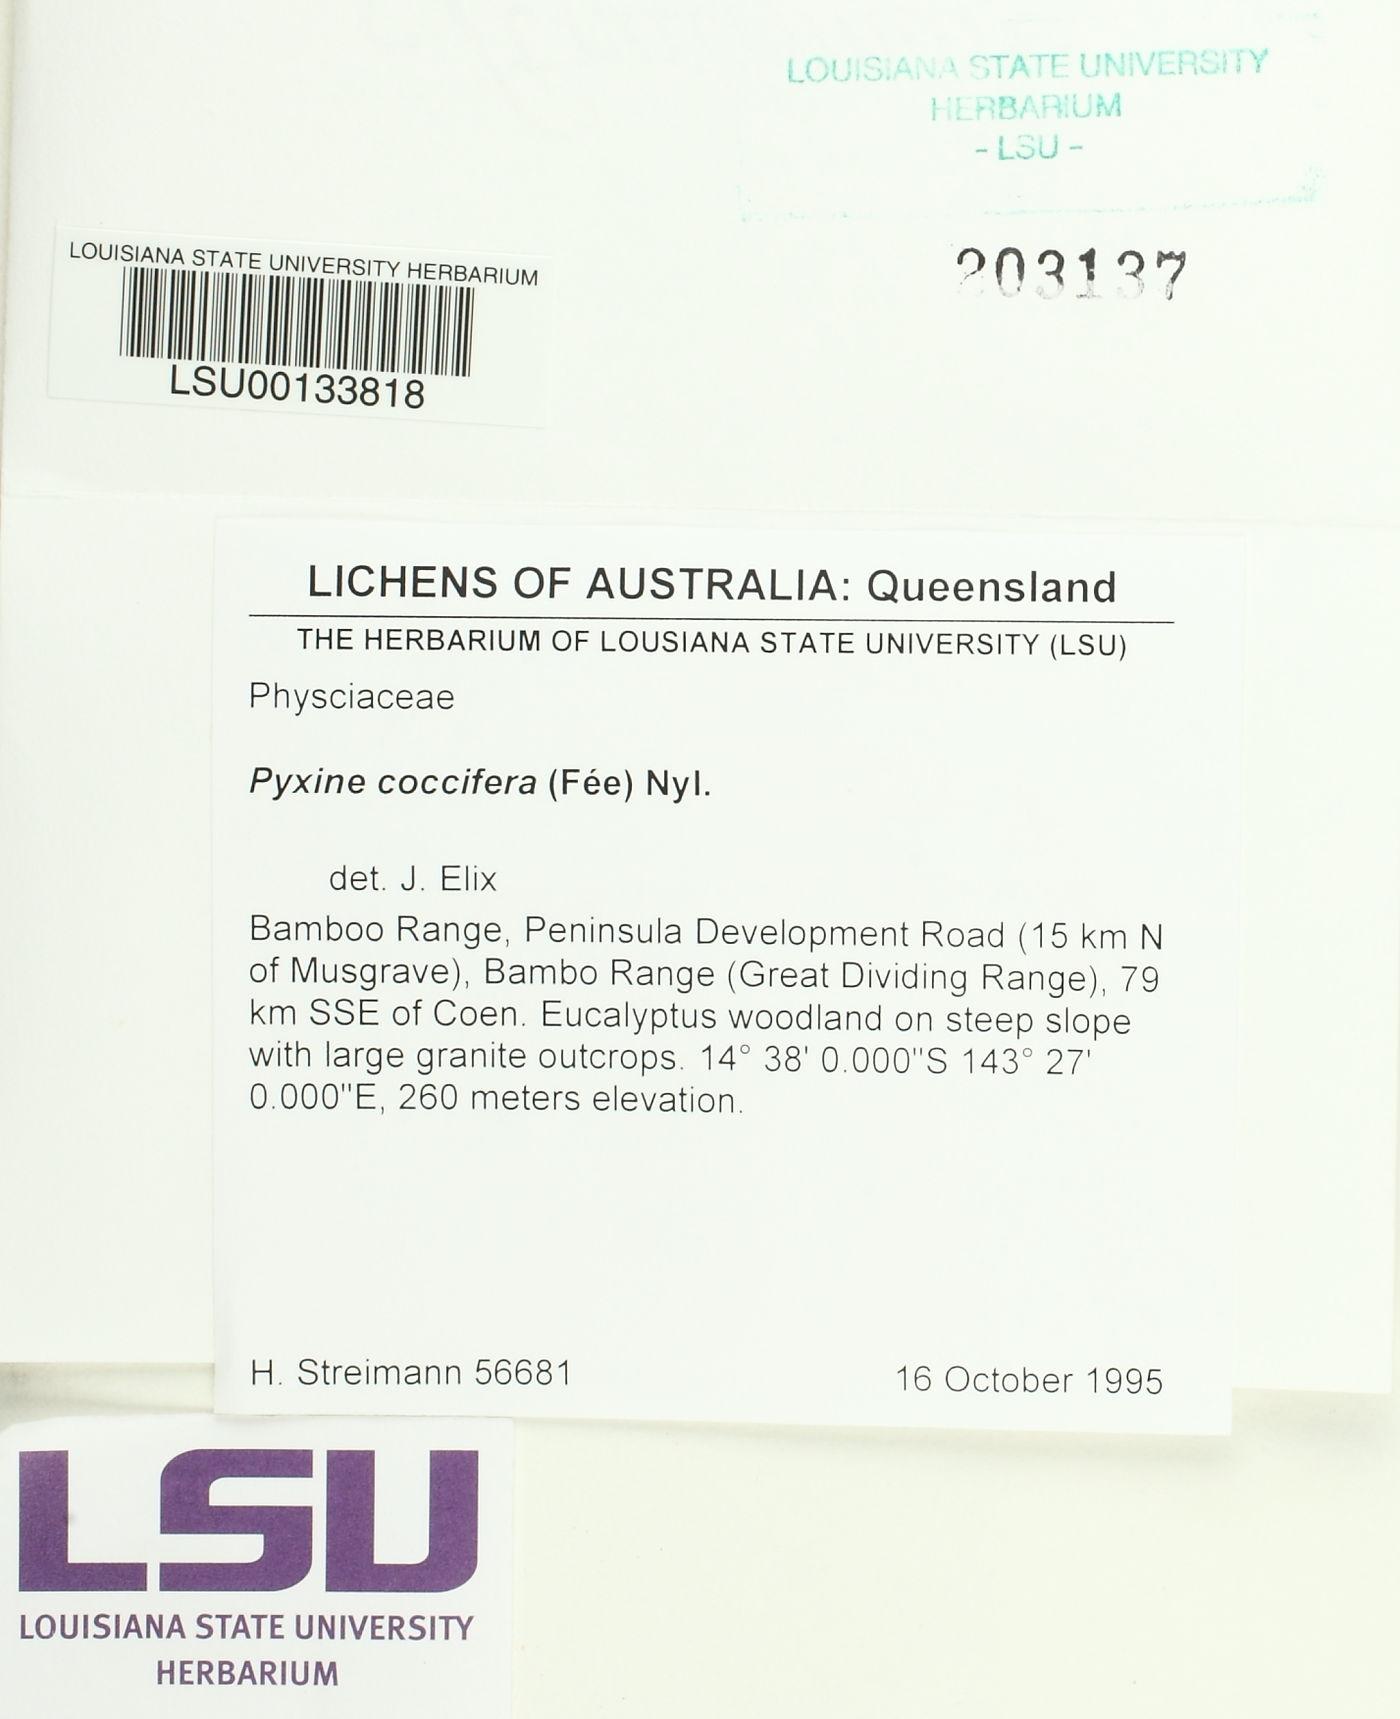 Pyxine coccifera image